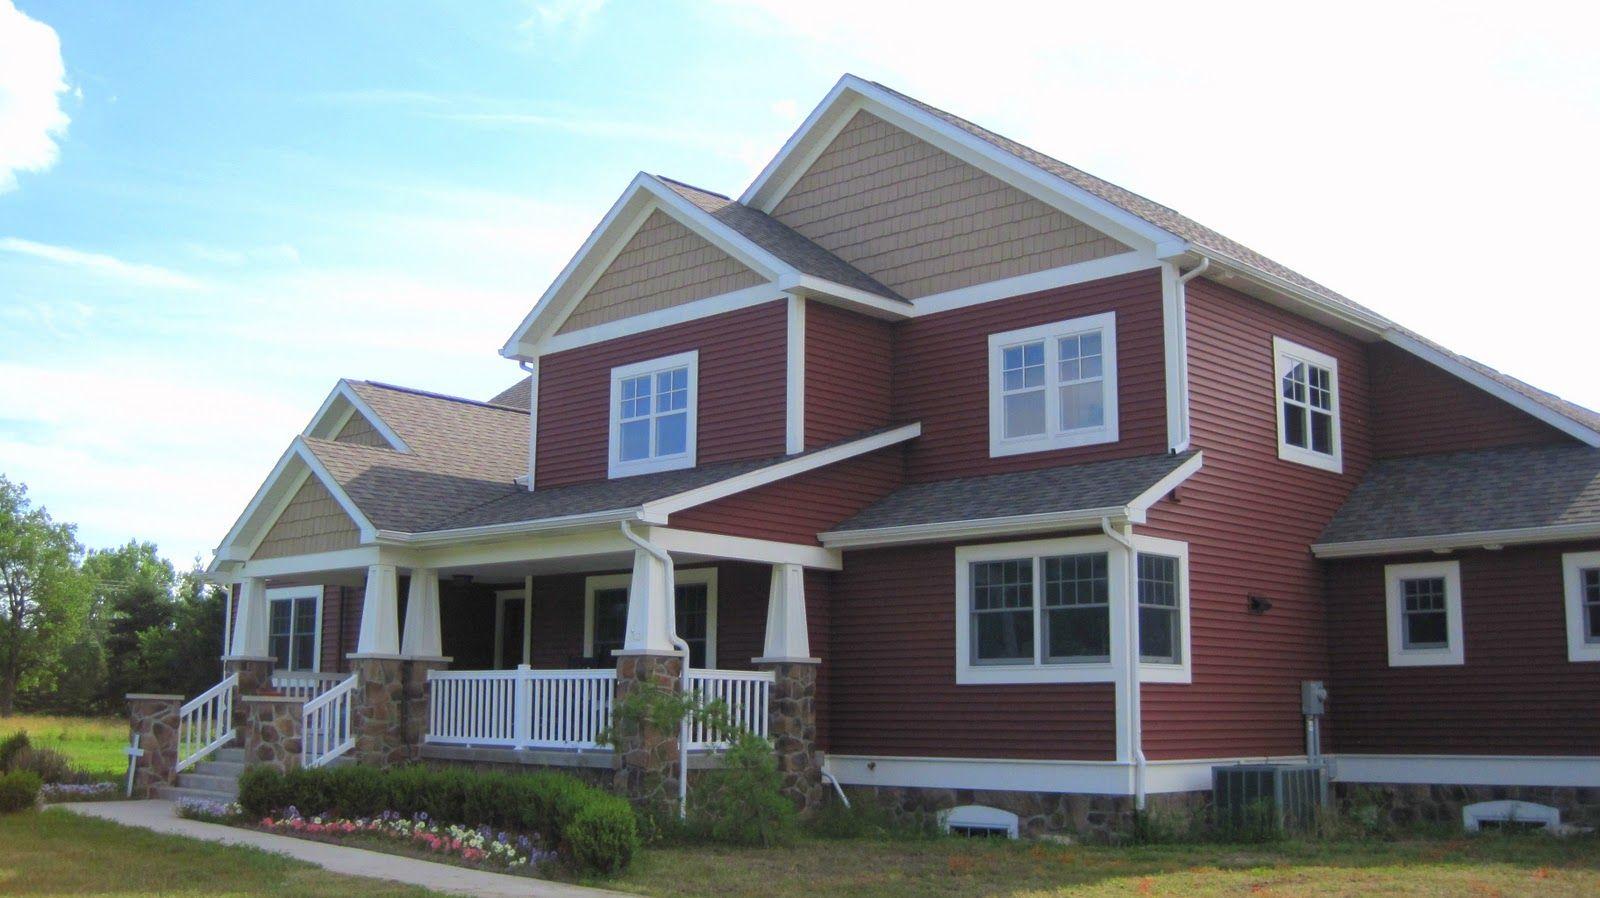 Red House With White Trim Cedar Shakes Craftsman Education - Home exterior design ideas siding